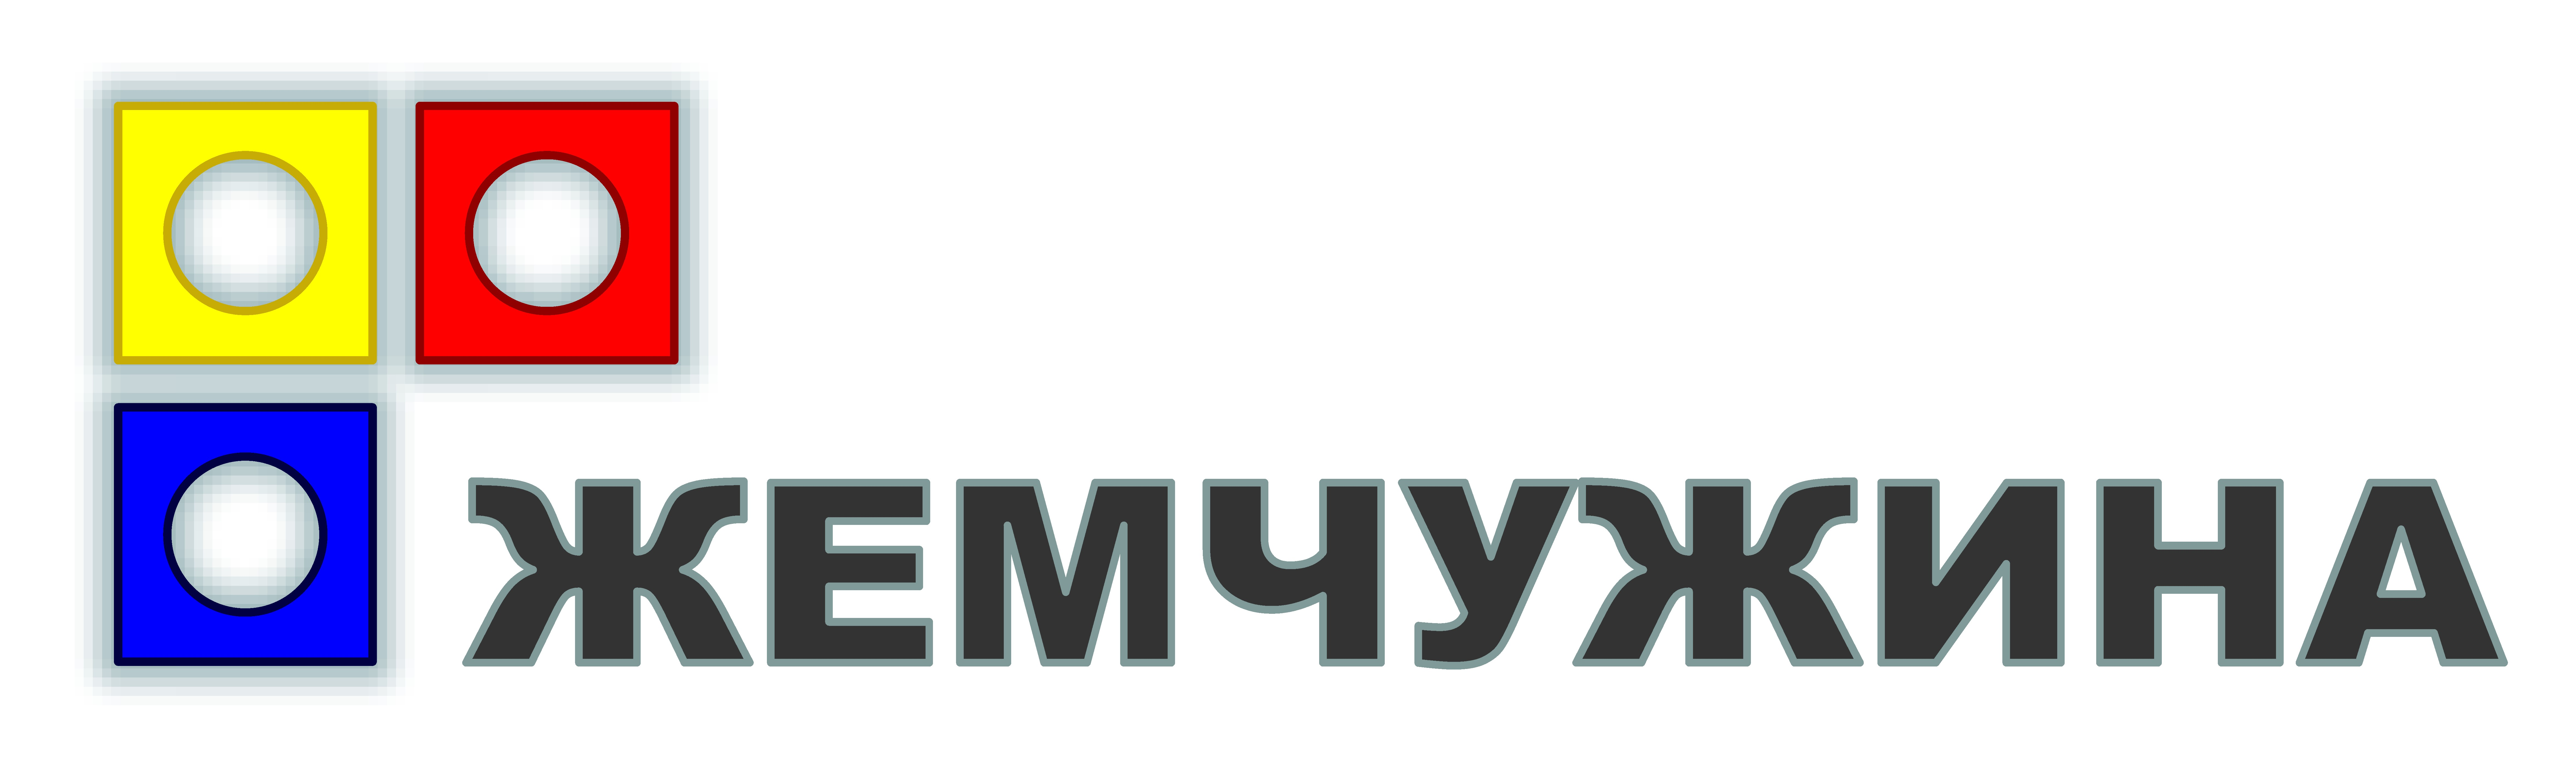 Логотип компании ЖЕМЧУЖИНА Красноярск